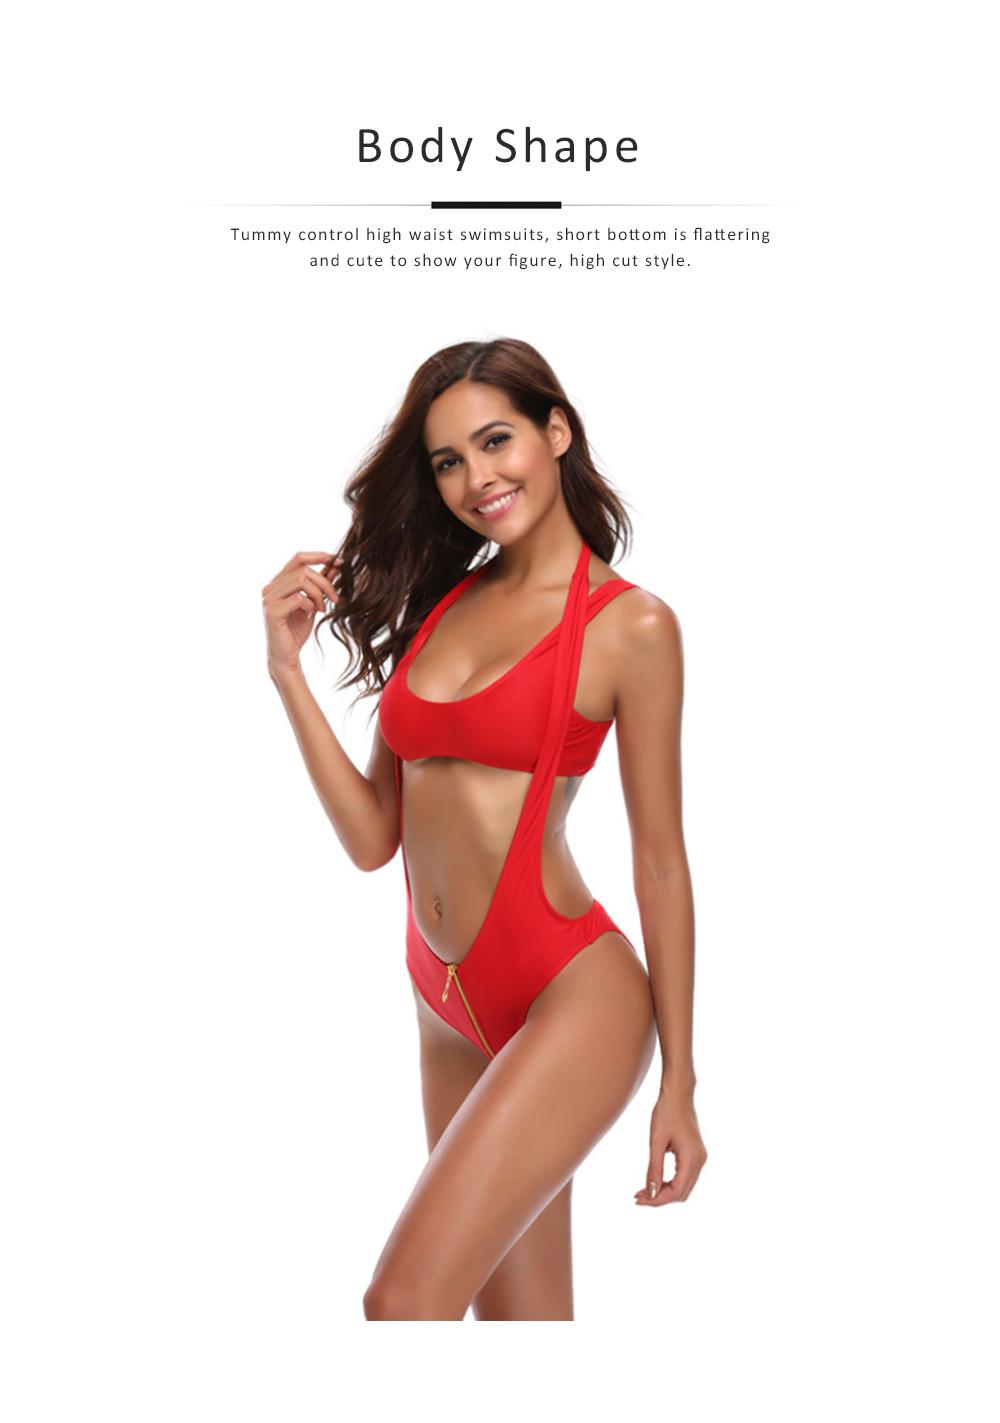 Women's Swimsuit Zipper Front High Waist High Cut Two Piece Bikini Sets Fashion Sexy Beachwear 5